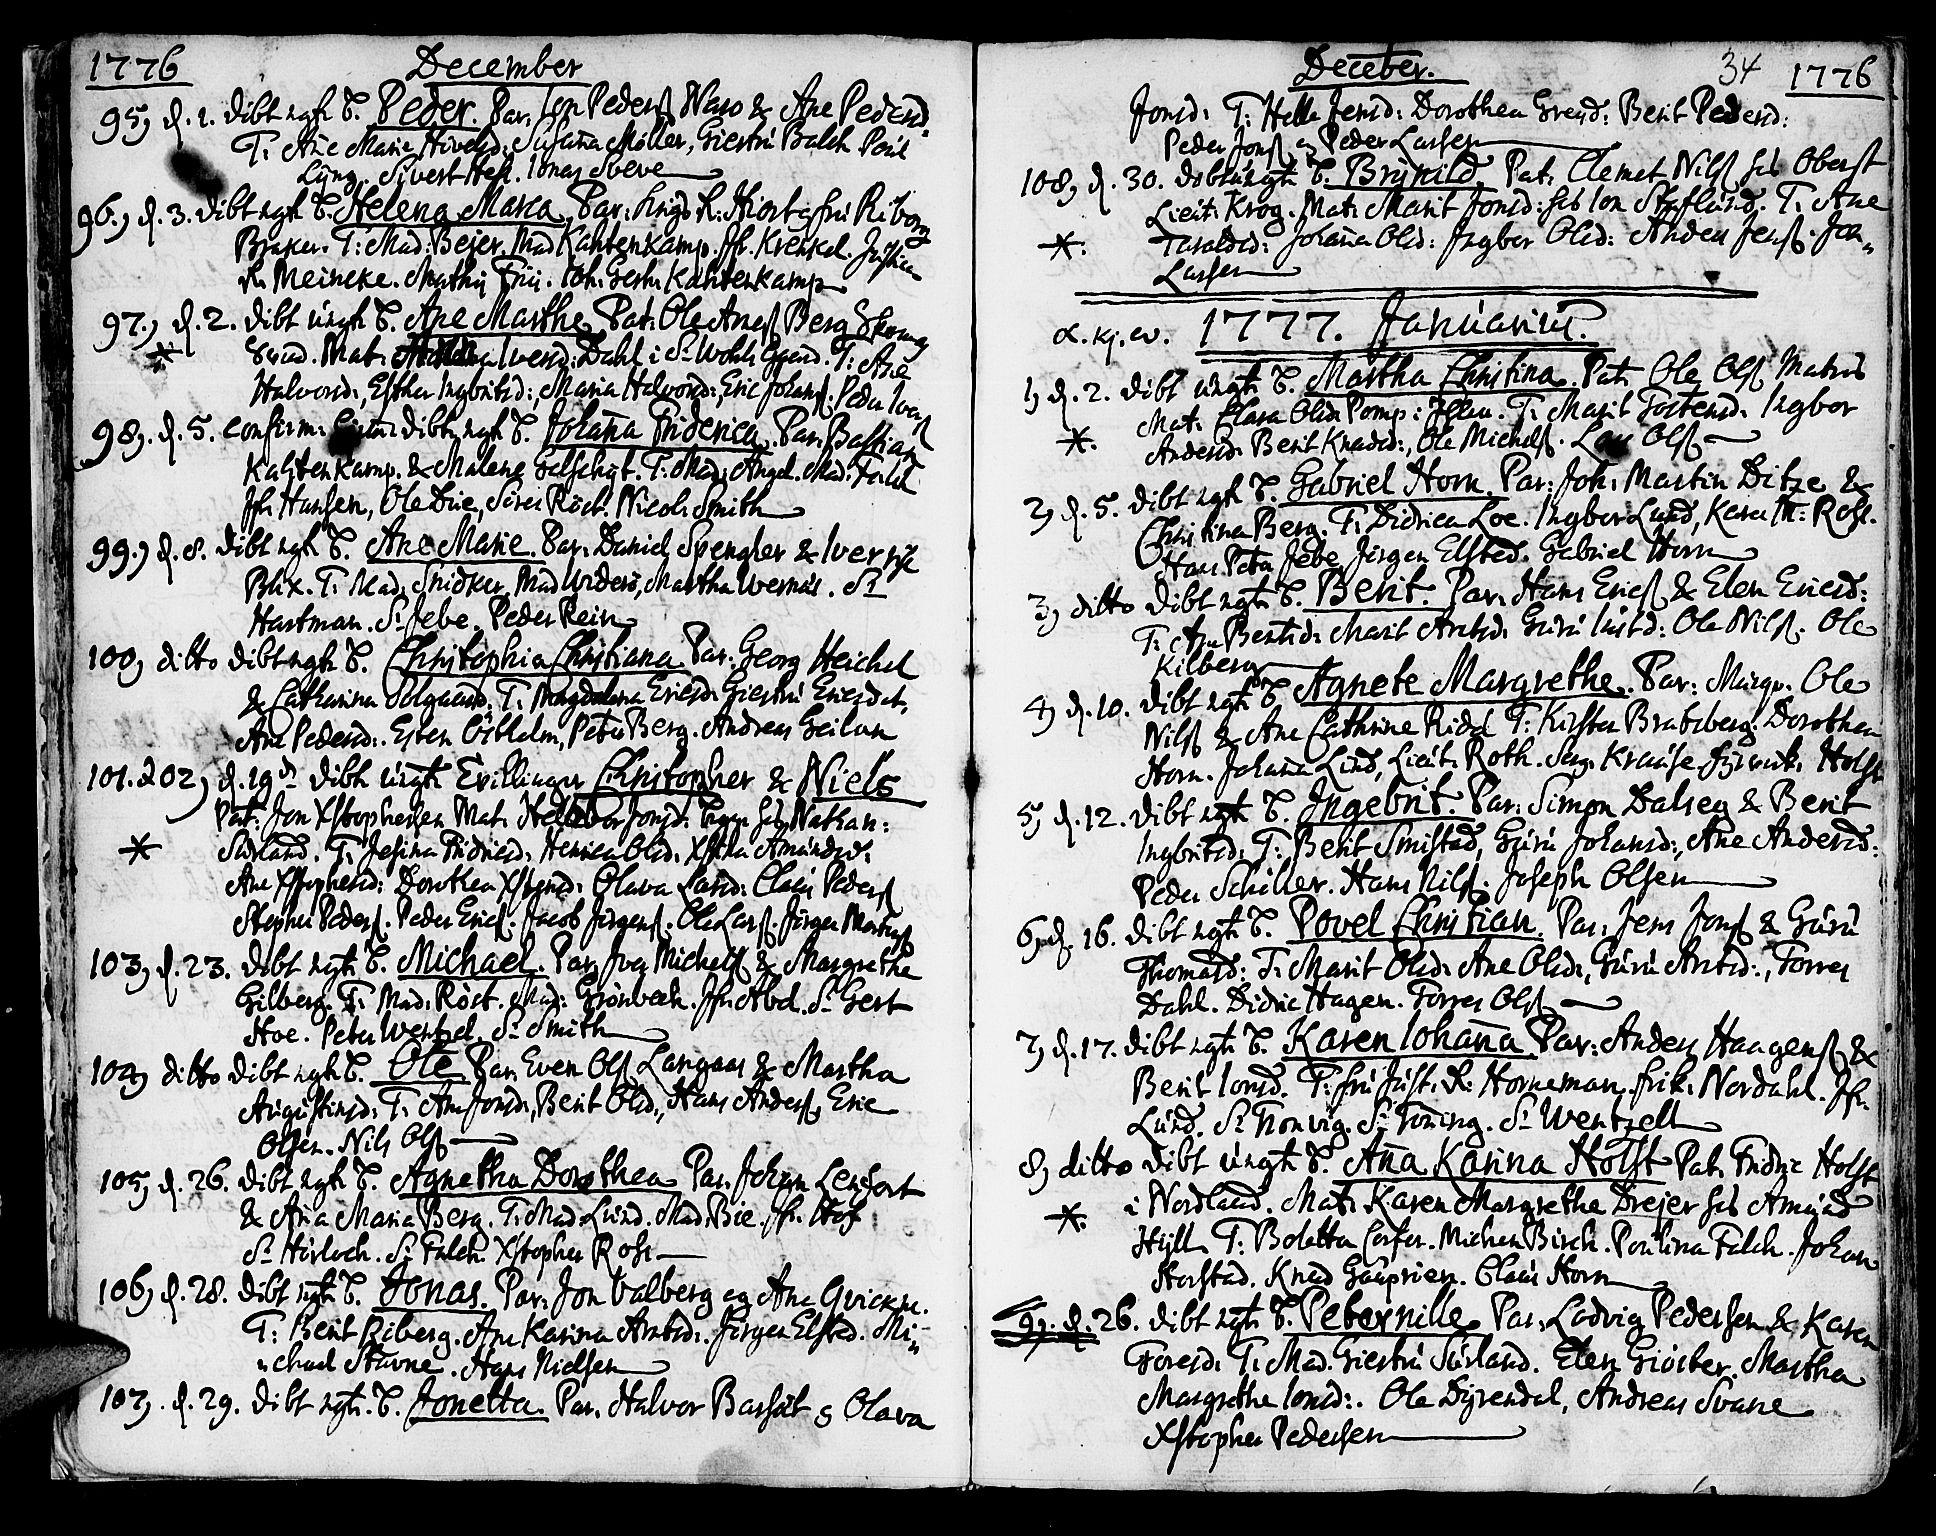 SAT, Ministerialprotokoller, klokkerbøker og fødselsregistre - Sør-Trøndelag, 601/L0039: Parish register (official) no. 601A07, 1770-1819, p. 34